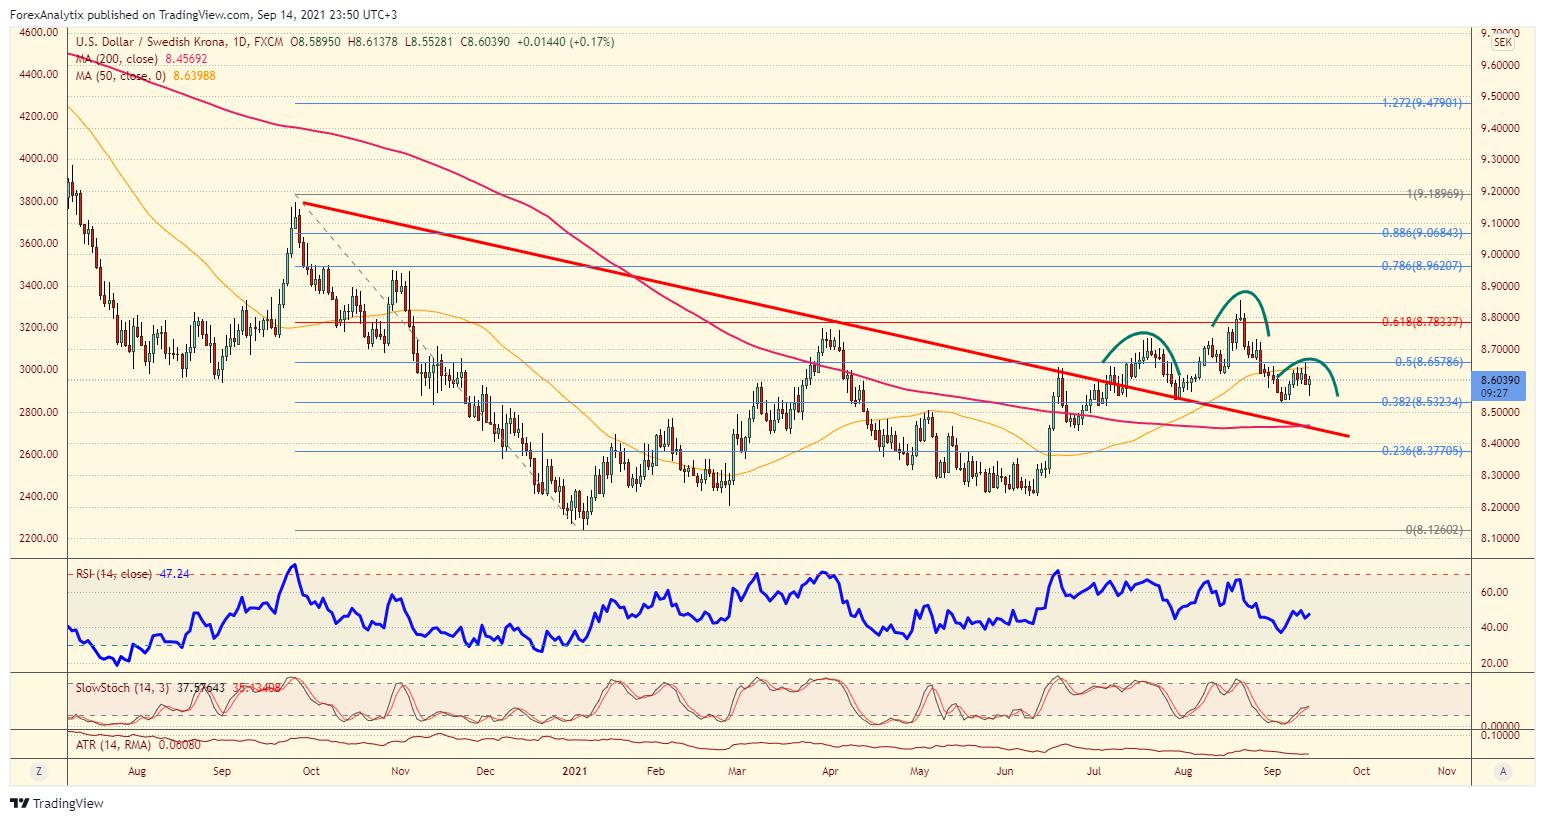 USD/SEK Daily Chart.